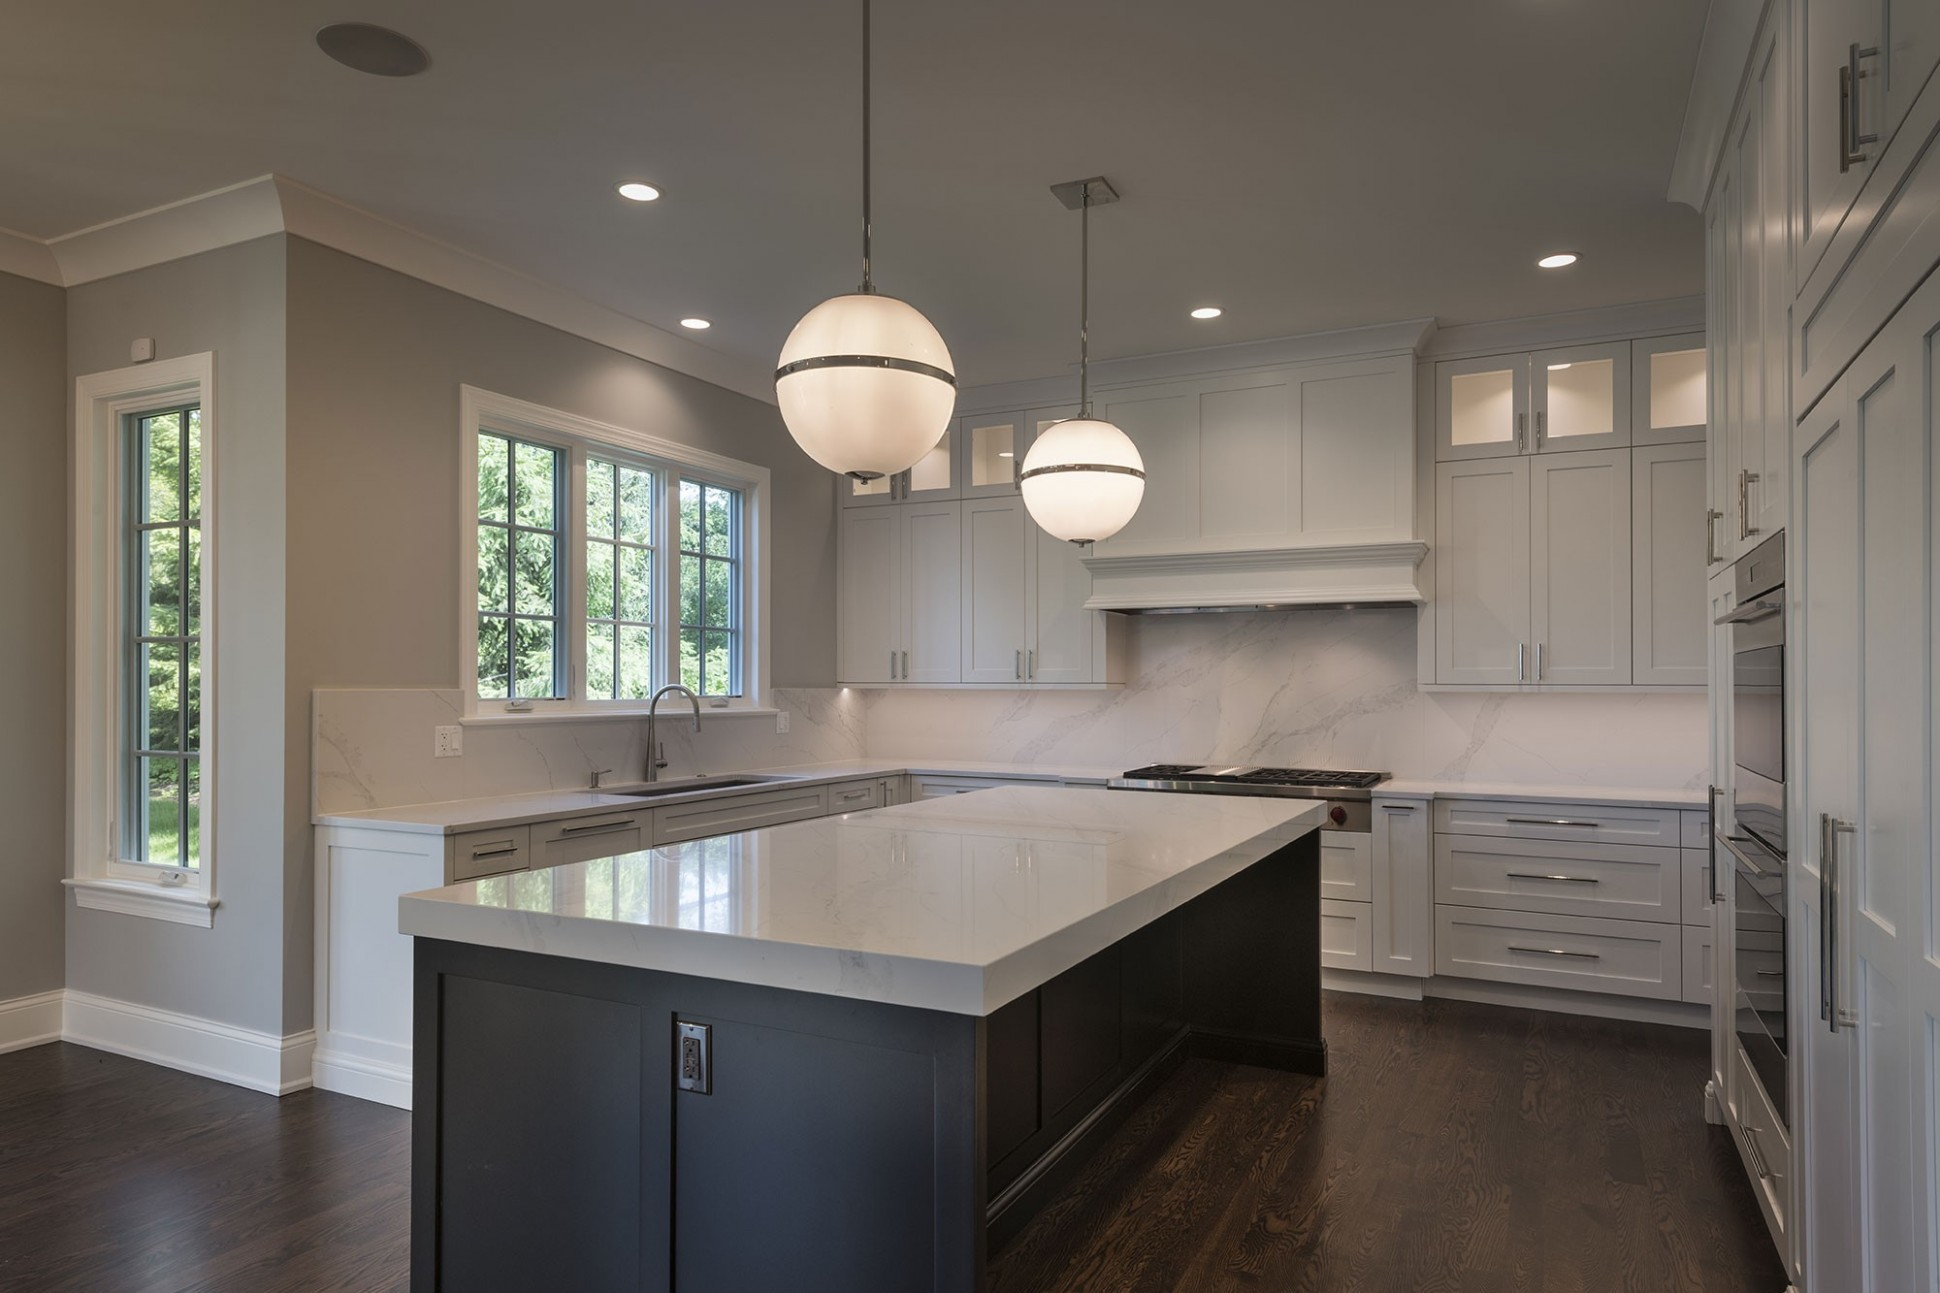 Gallery – Kitchen and Bathroom Cabinets  Kitchen Cabinets, Bath  - Kitchen Cabinets Niles